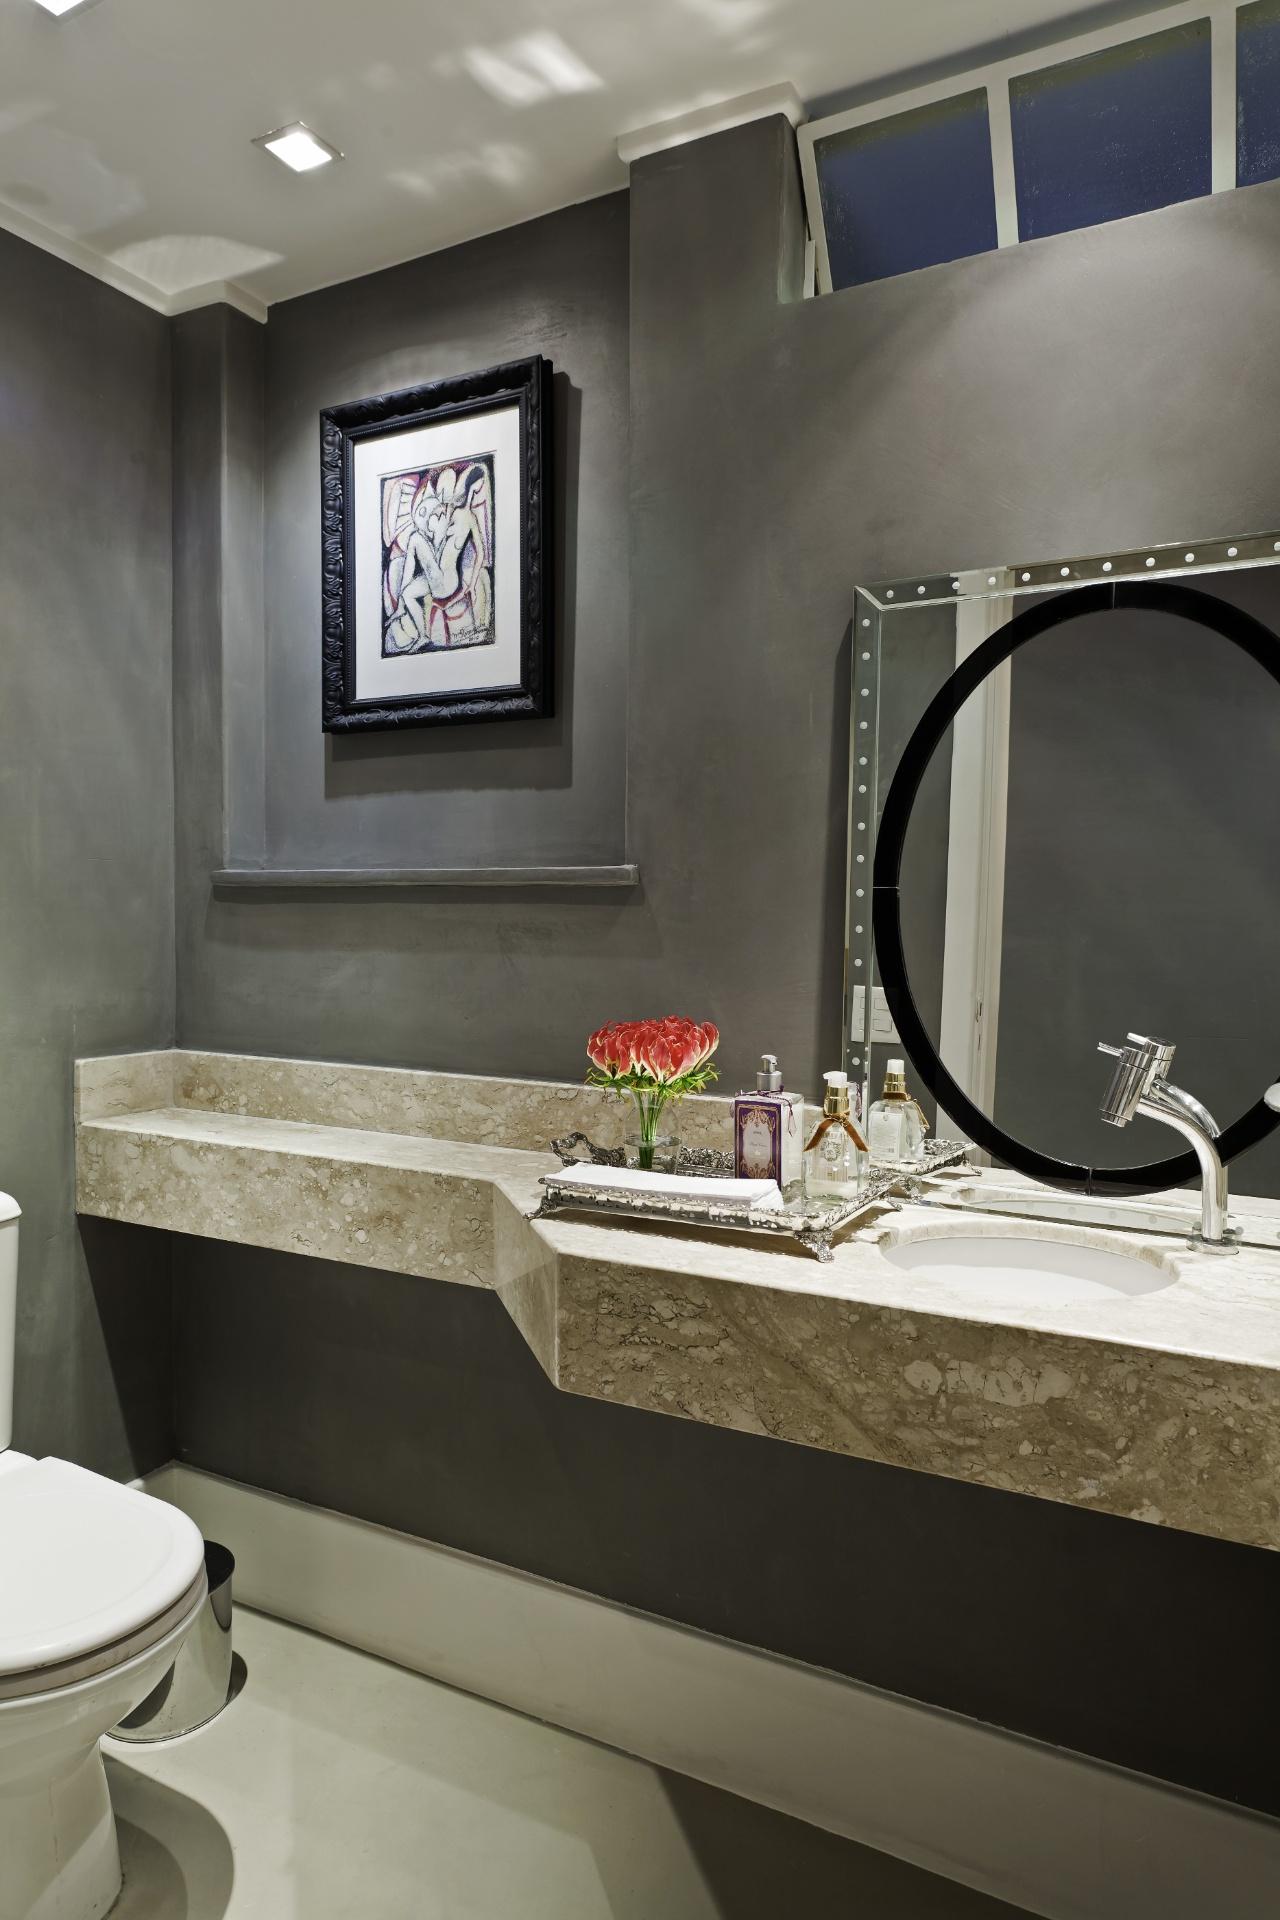 uol decoracao lavabo : uol decoracao lavabo:preview